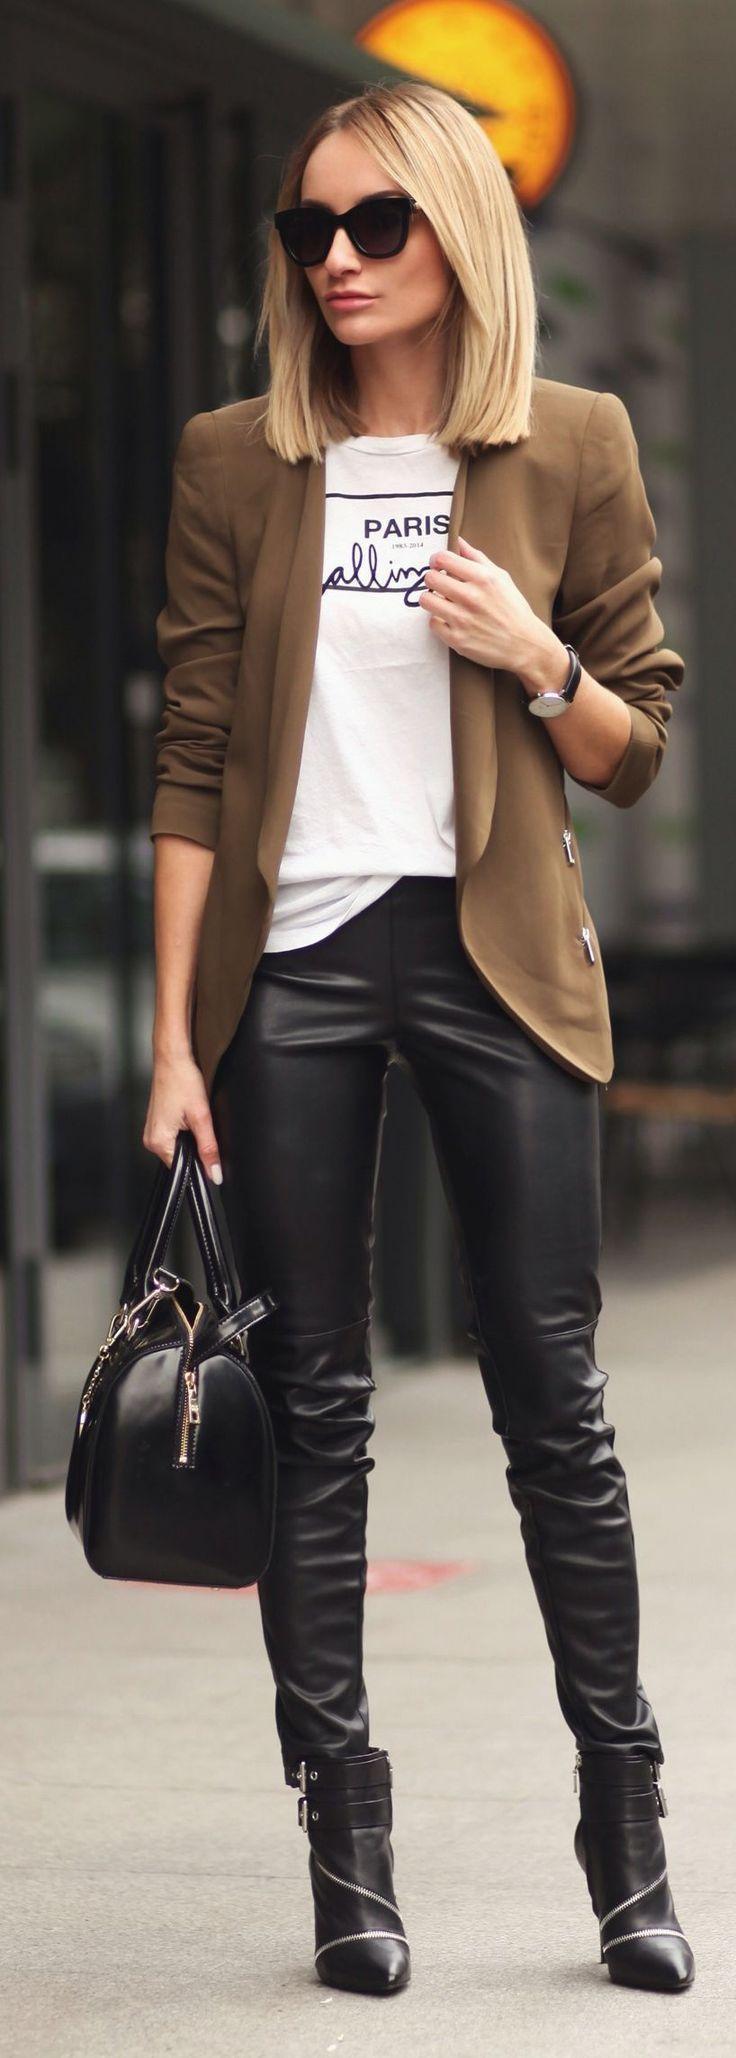 @roressclothes closet ideas #women fashion outfit #clothing style apparel camel blazer, black trousers, white shirt